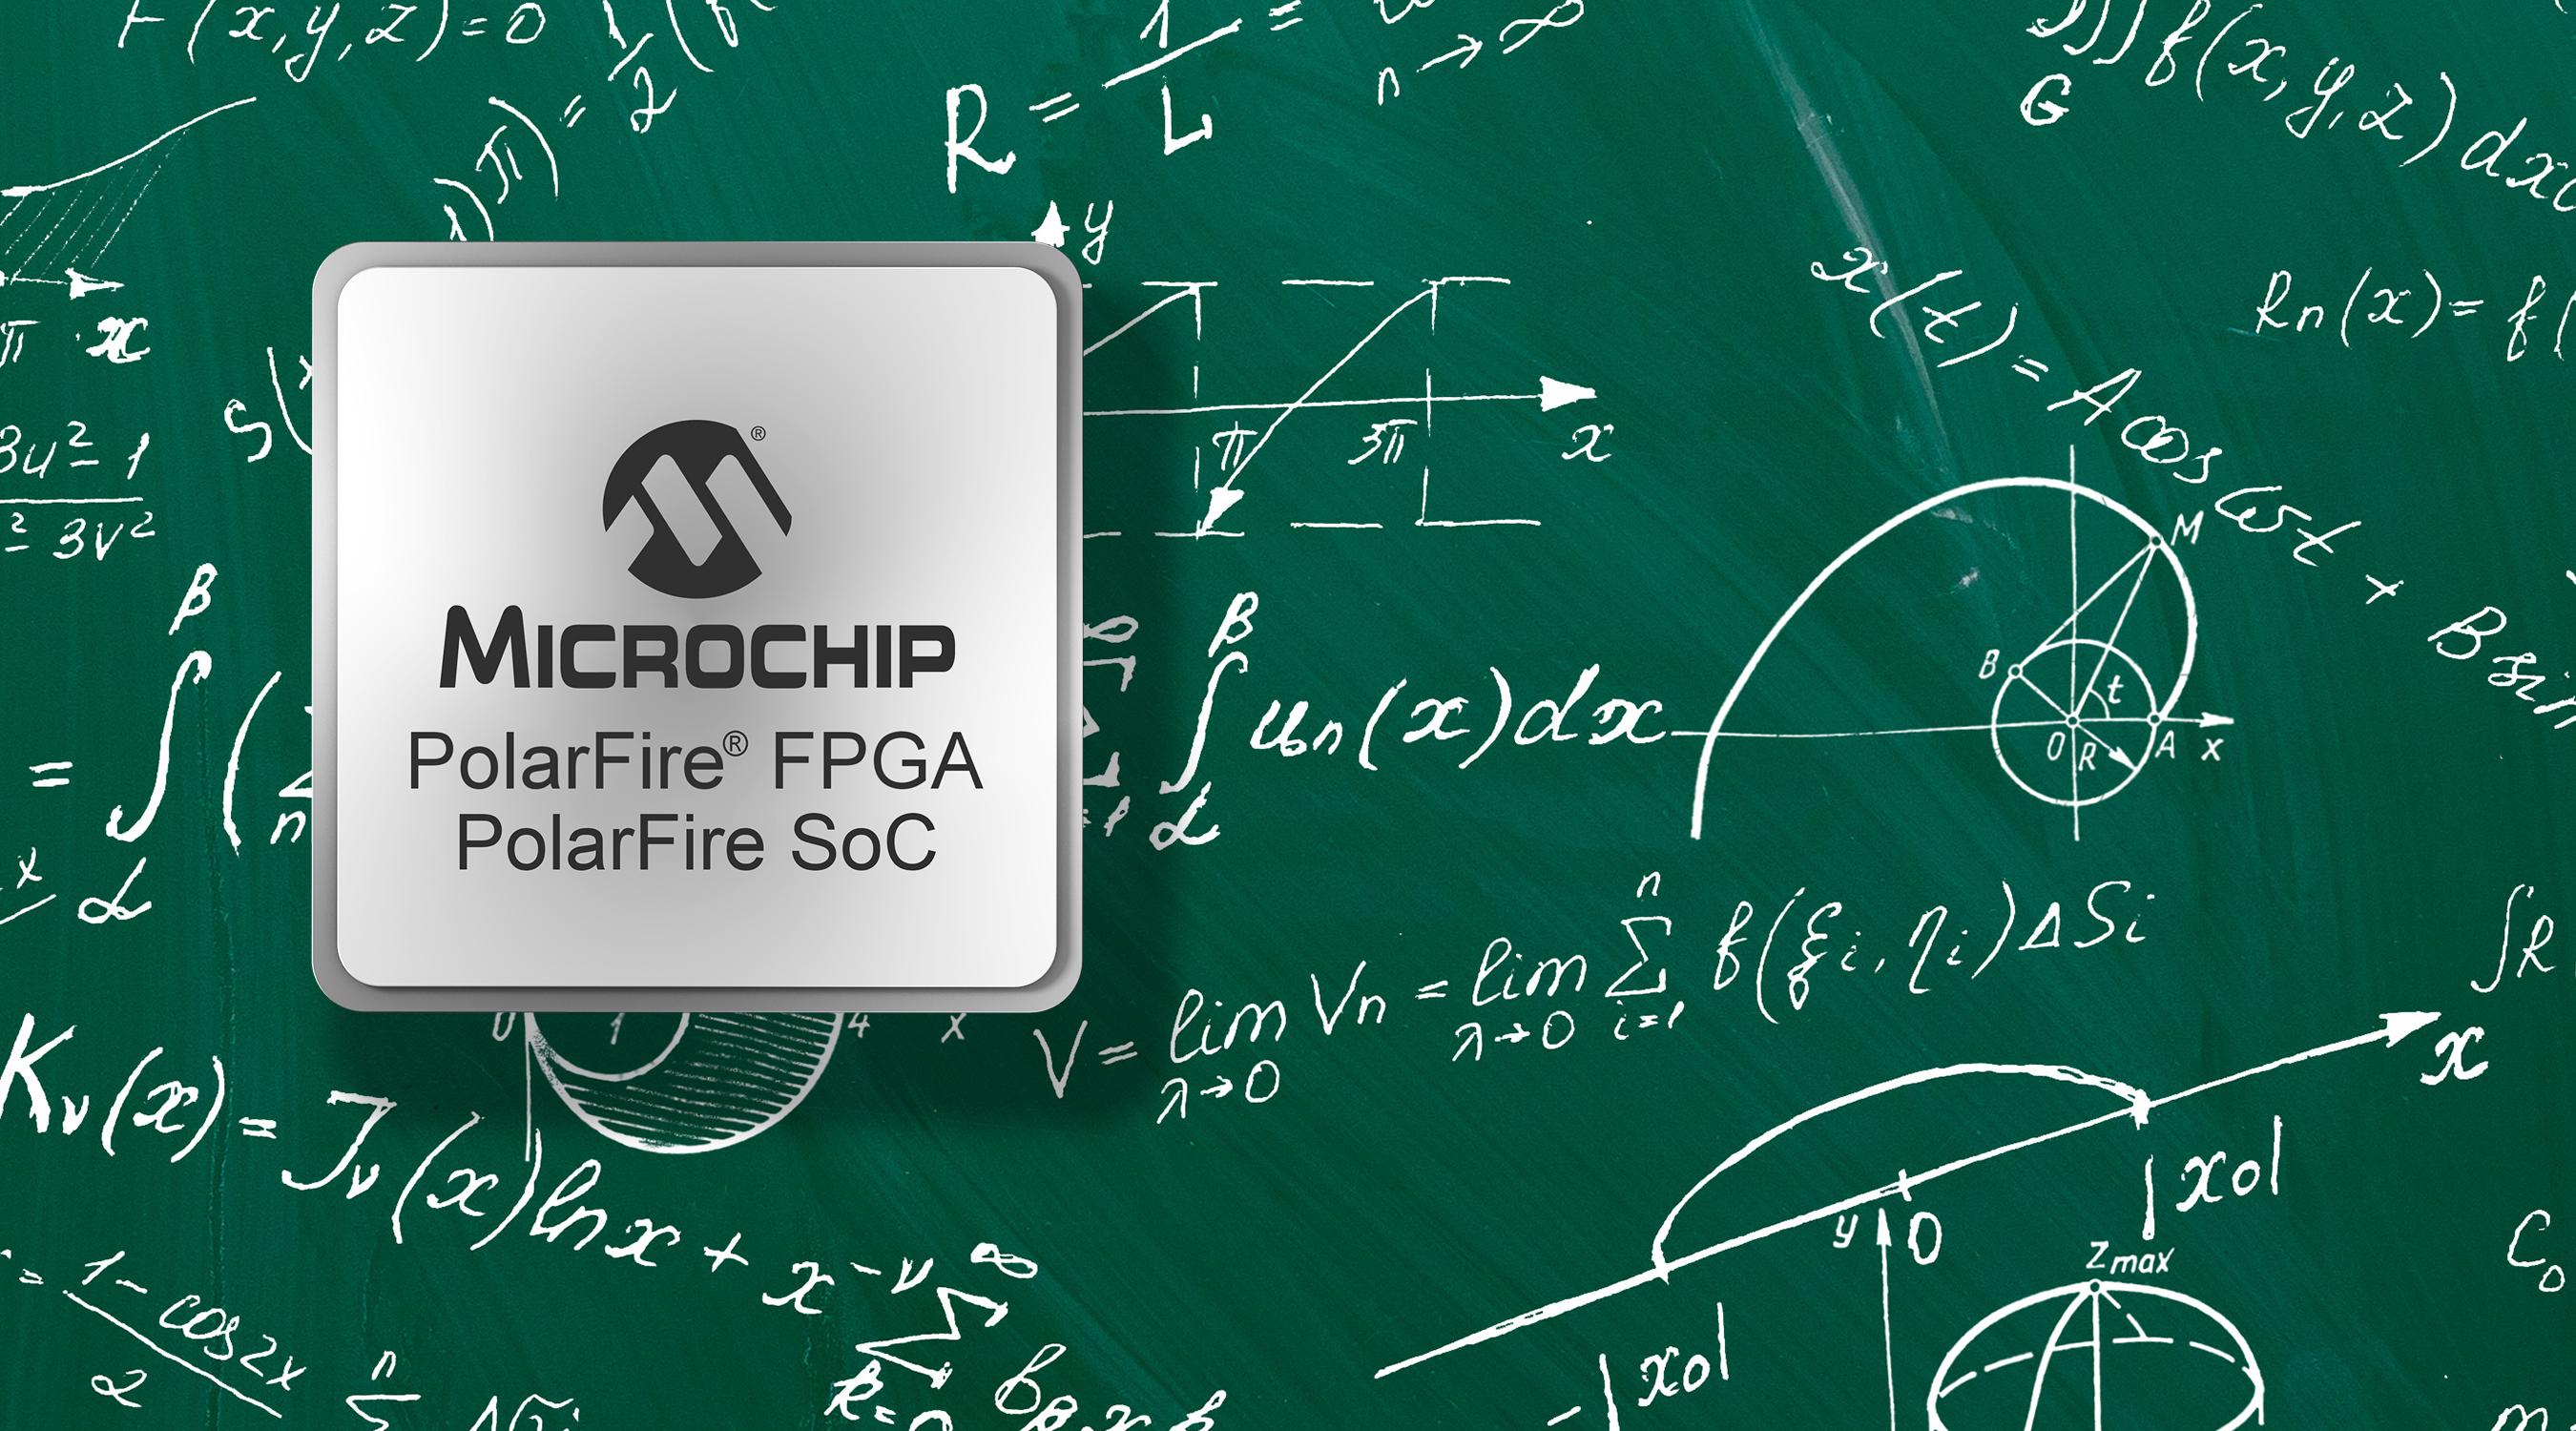 Microchip发布智能高级合成(HLS)工具套件, 助力客户使用PolarFire® FPGA平台进行基于C++的算法开发